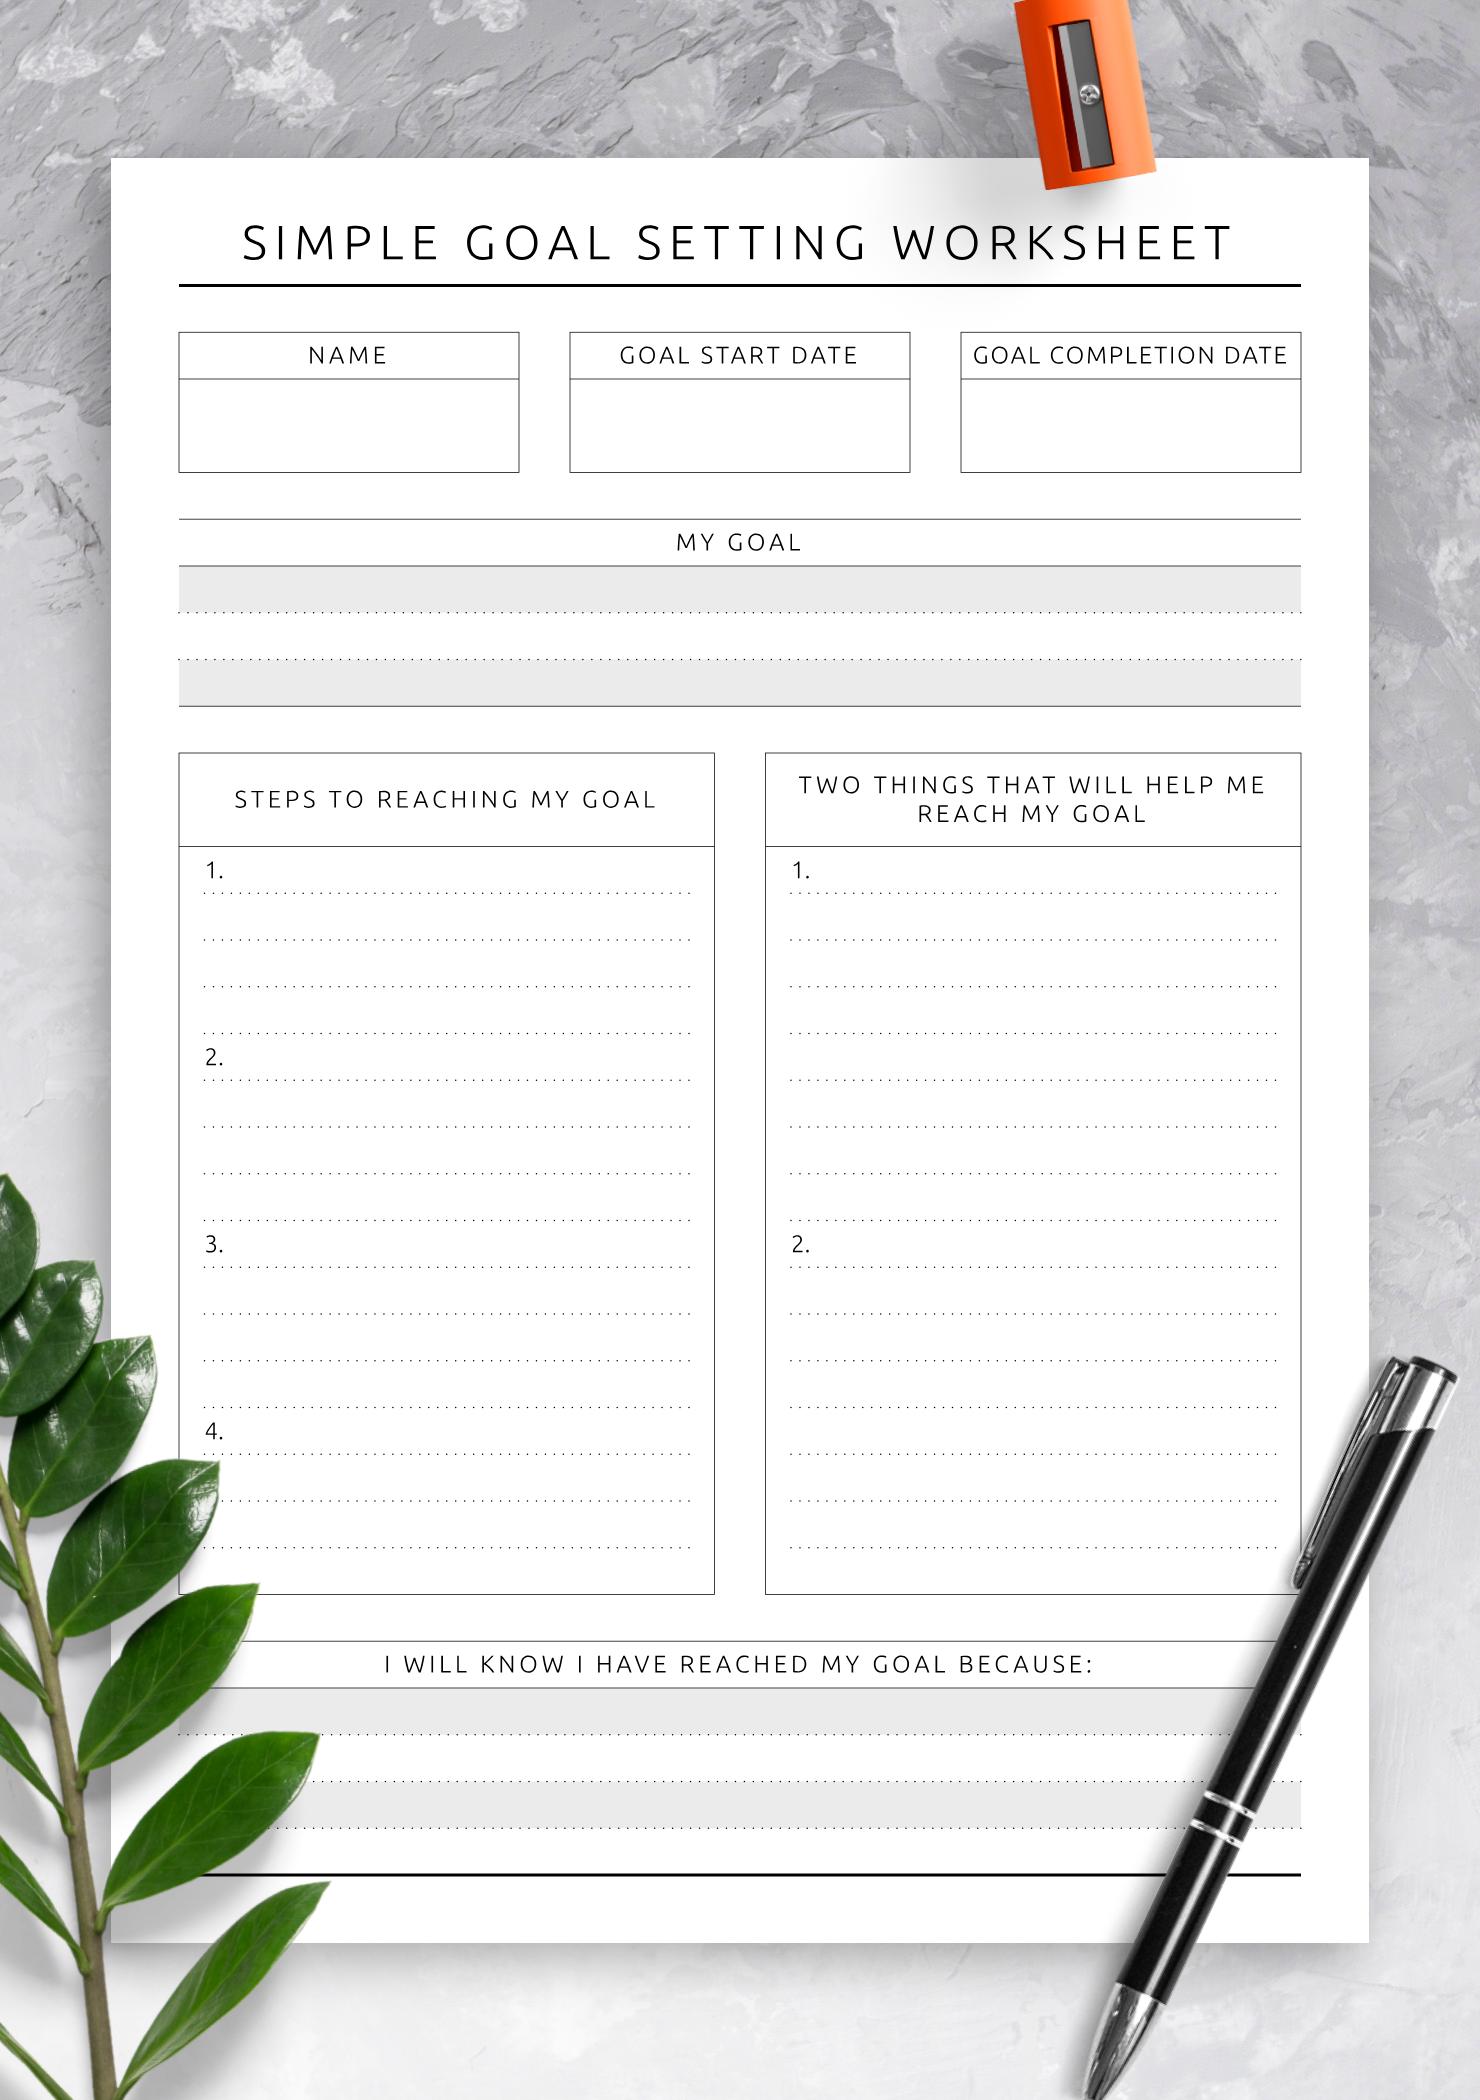 Simple Goal Setting Worksheet